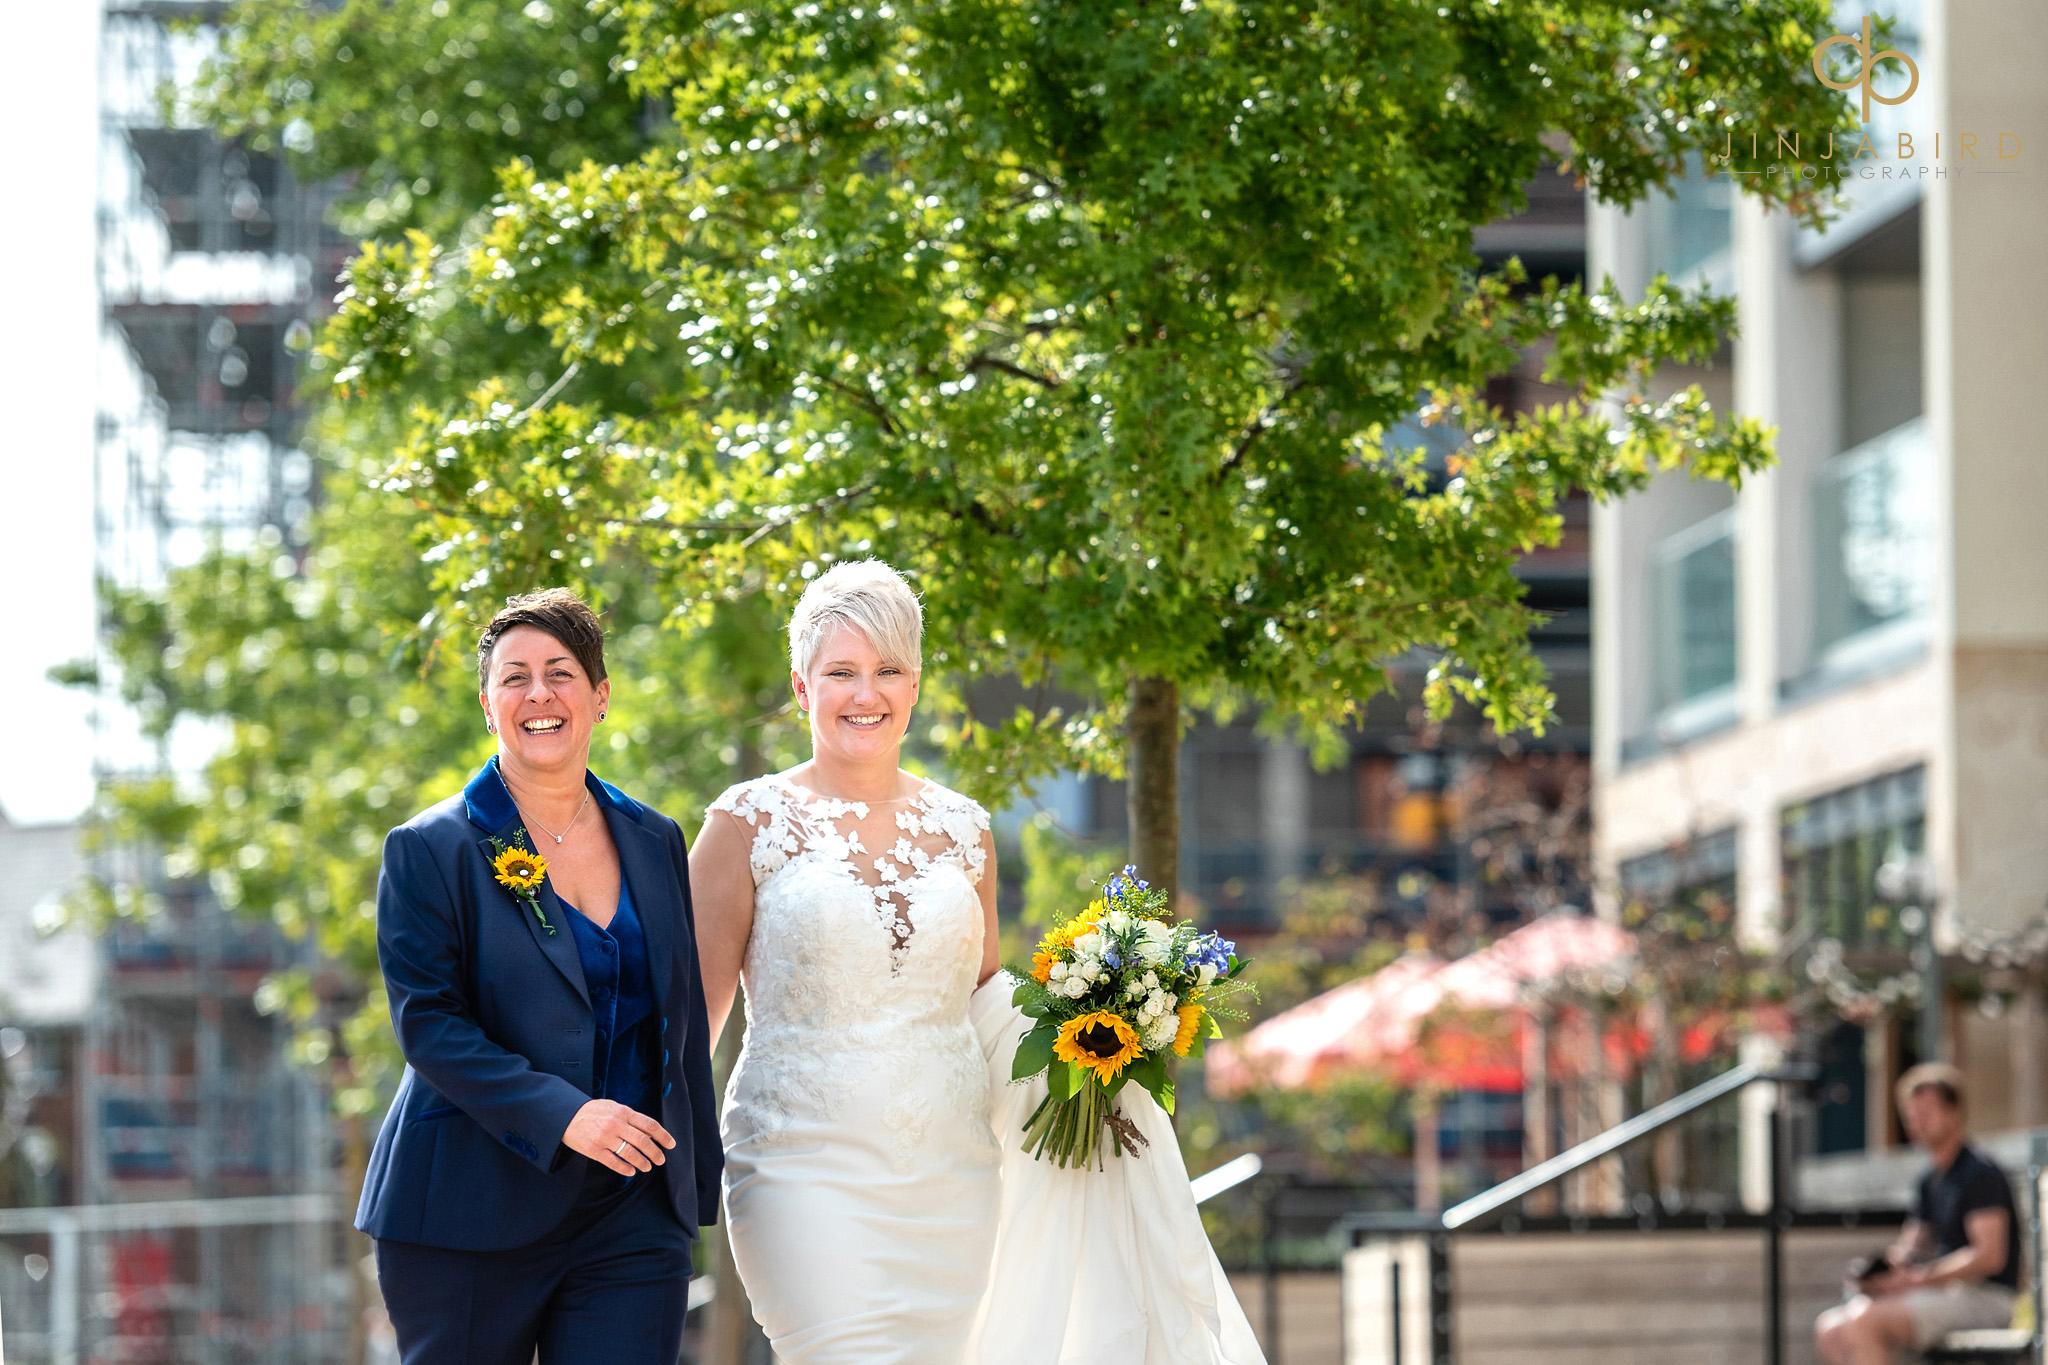 wedding photographs bedford embankment